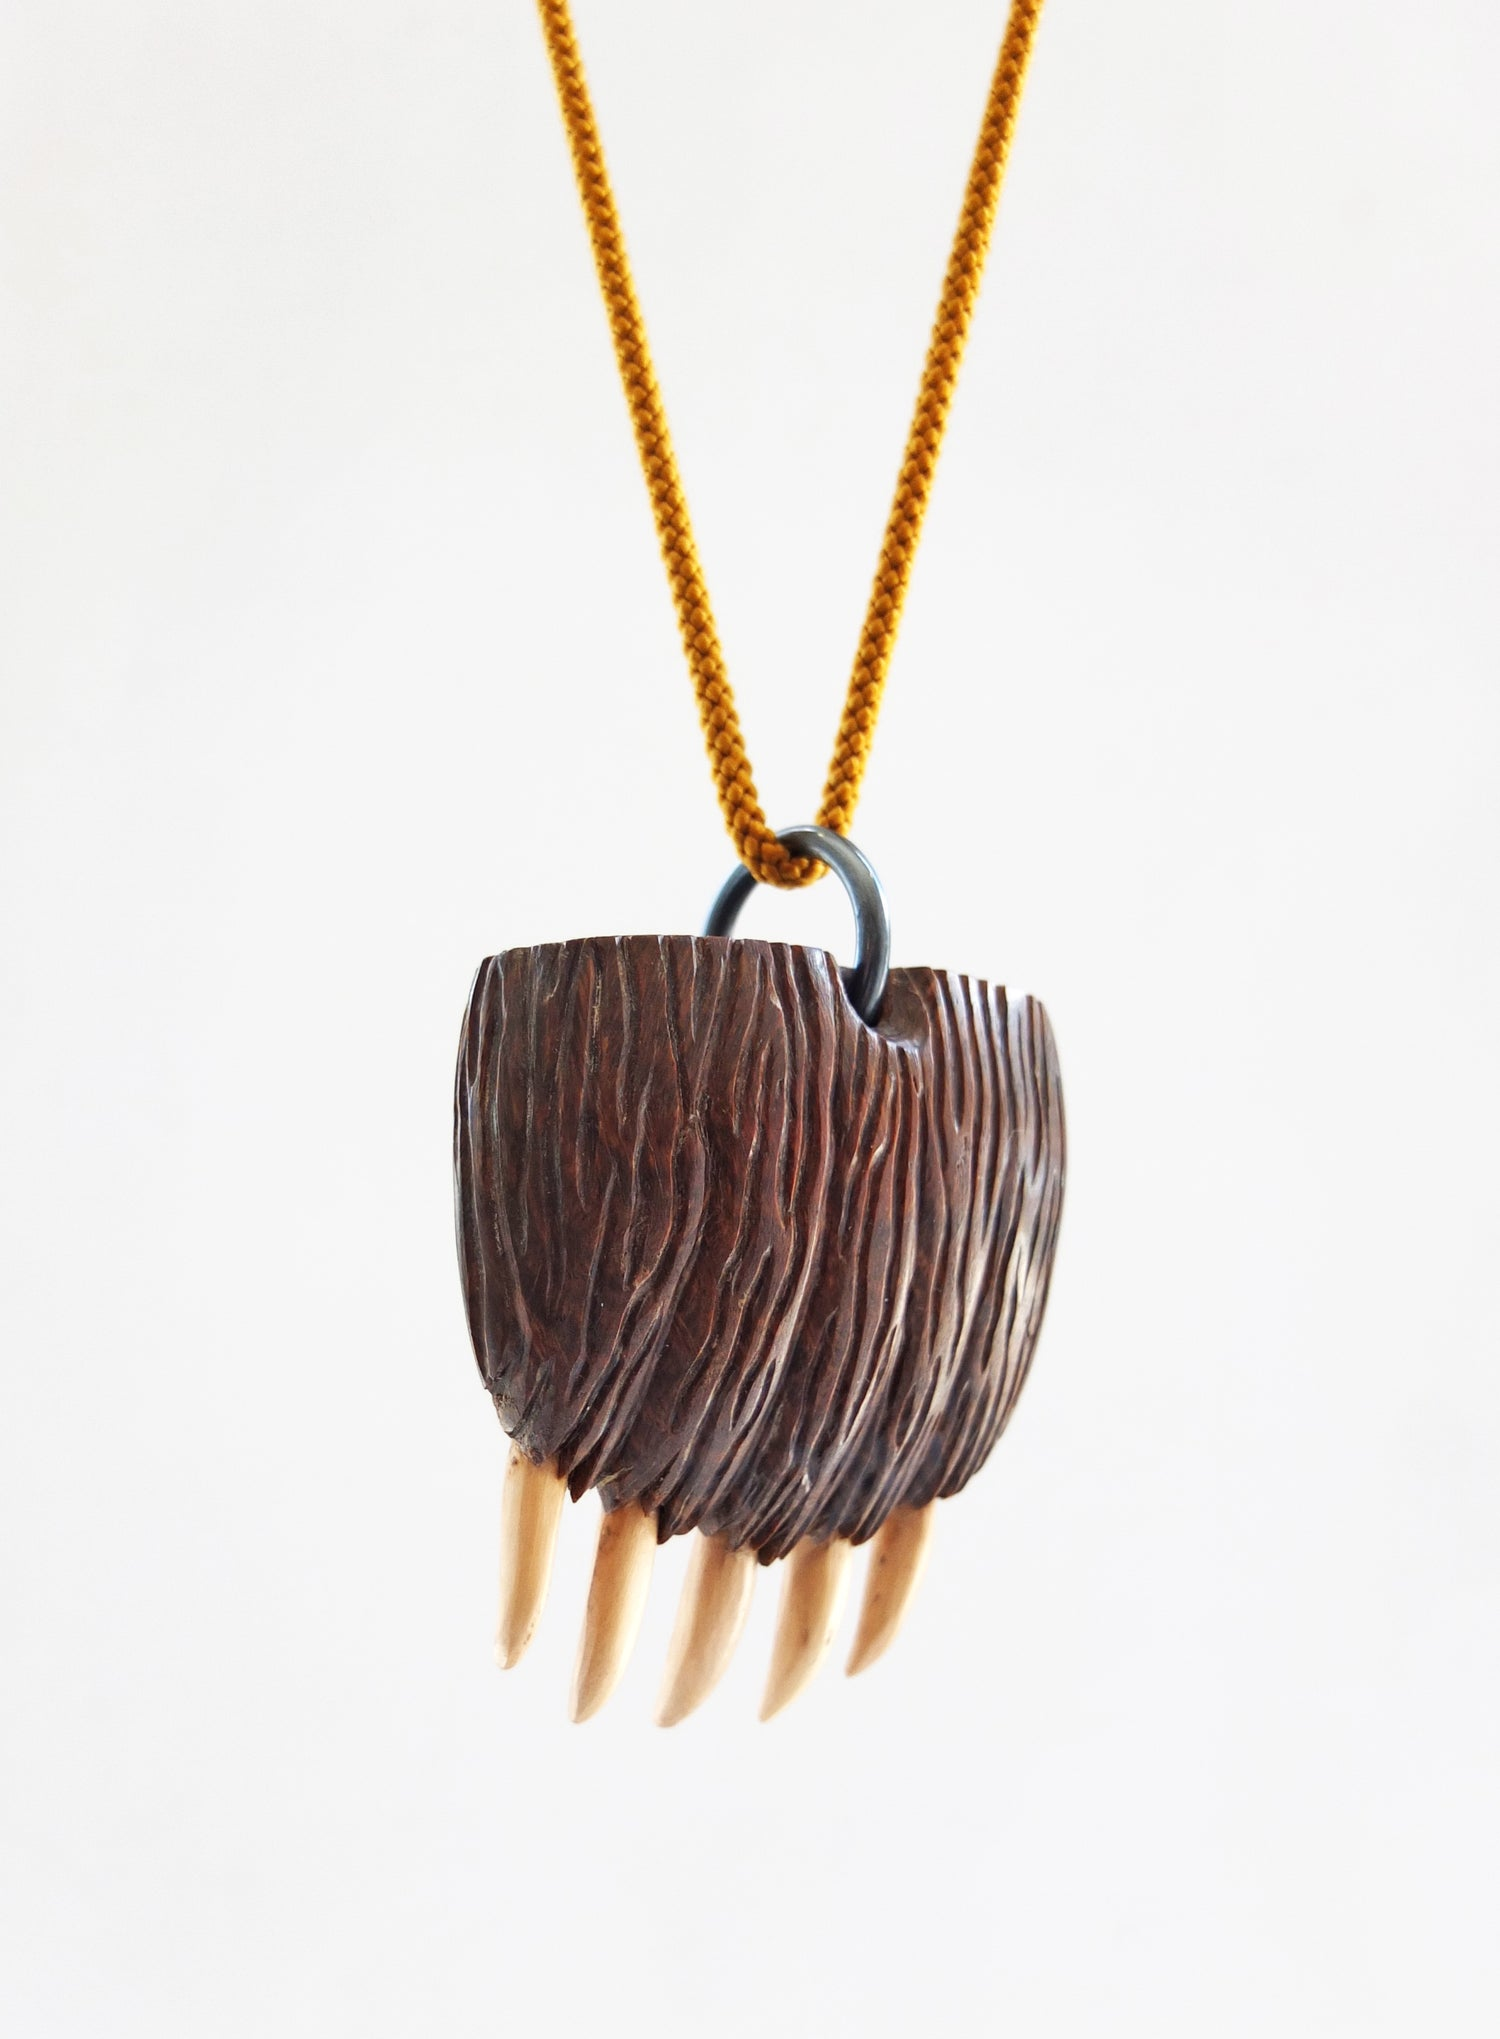 Image of Jane Dodd (New Zealand) Big Grizzly Paw pendant